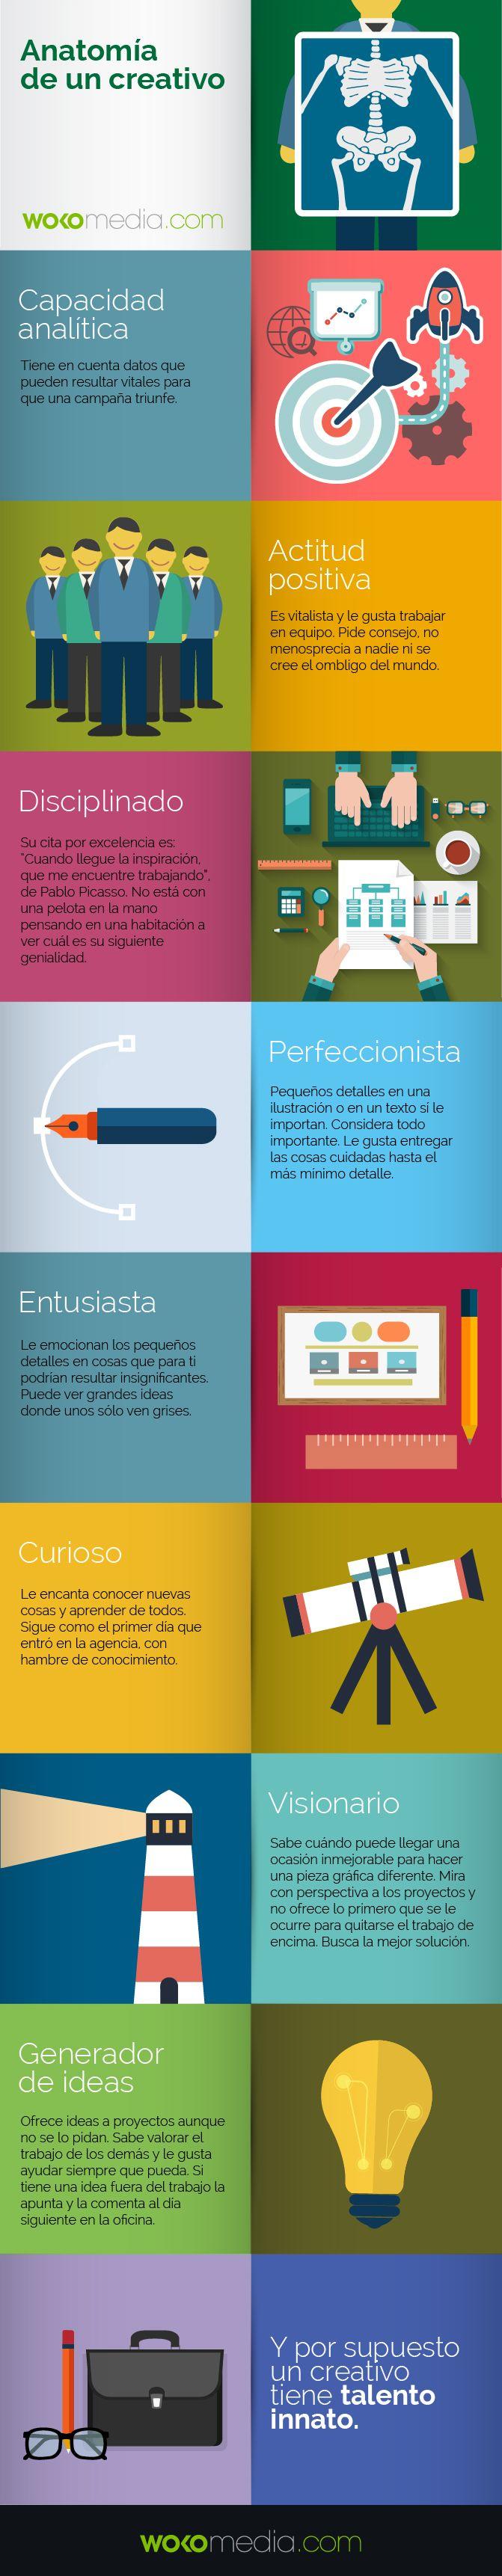 Anatomía de un creativo de marketing #infografia #infographic #marketing